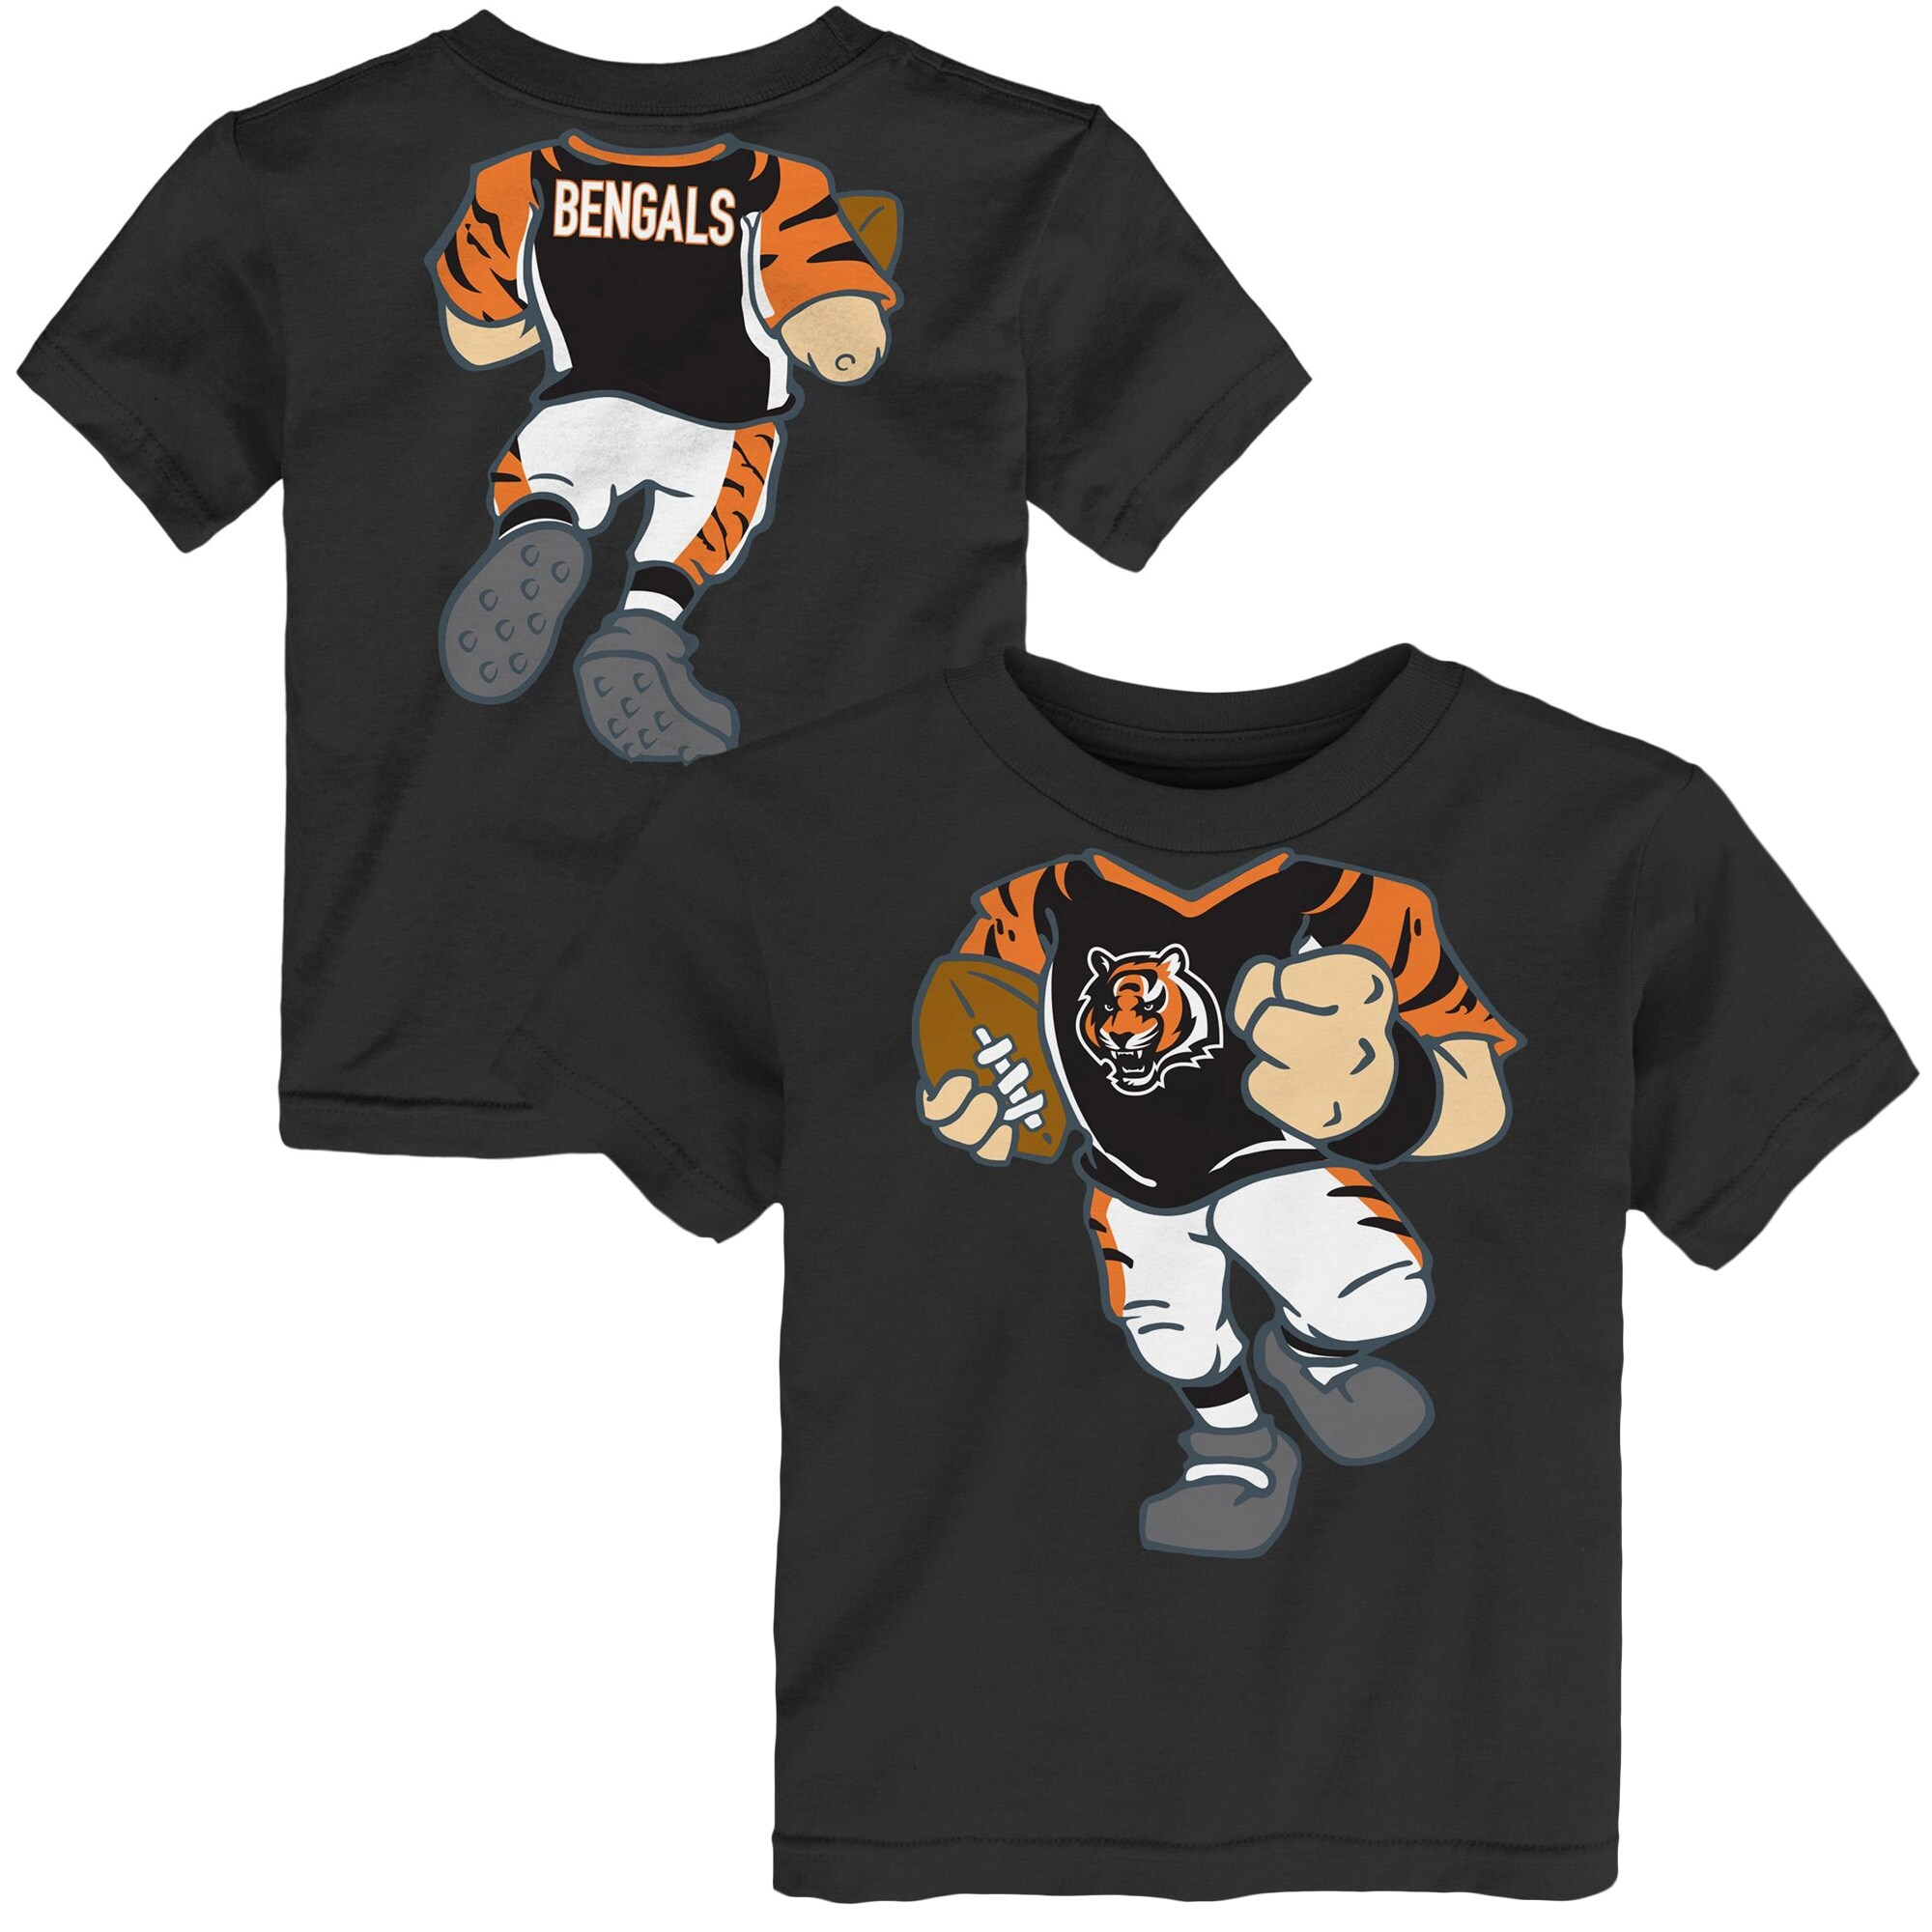 Cincinnati Bengals Toddler Football Dreams T-Shirt - Black